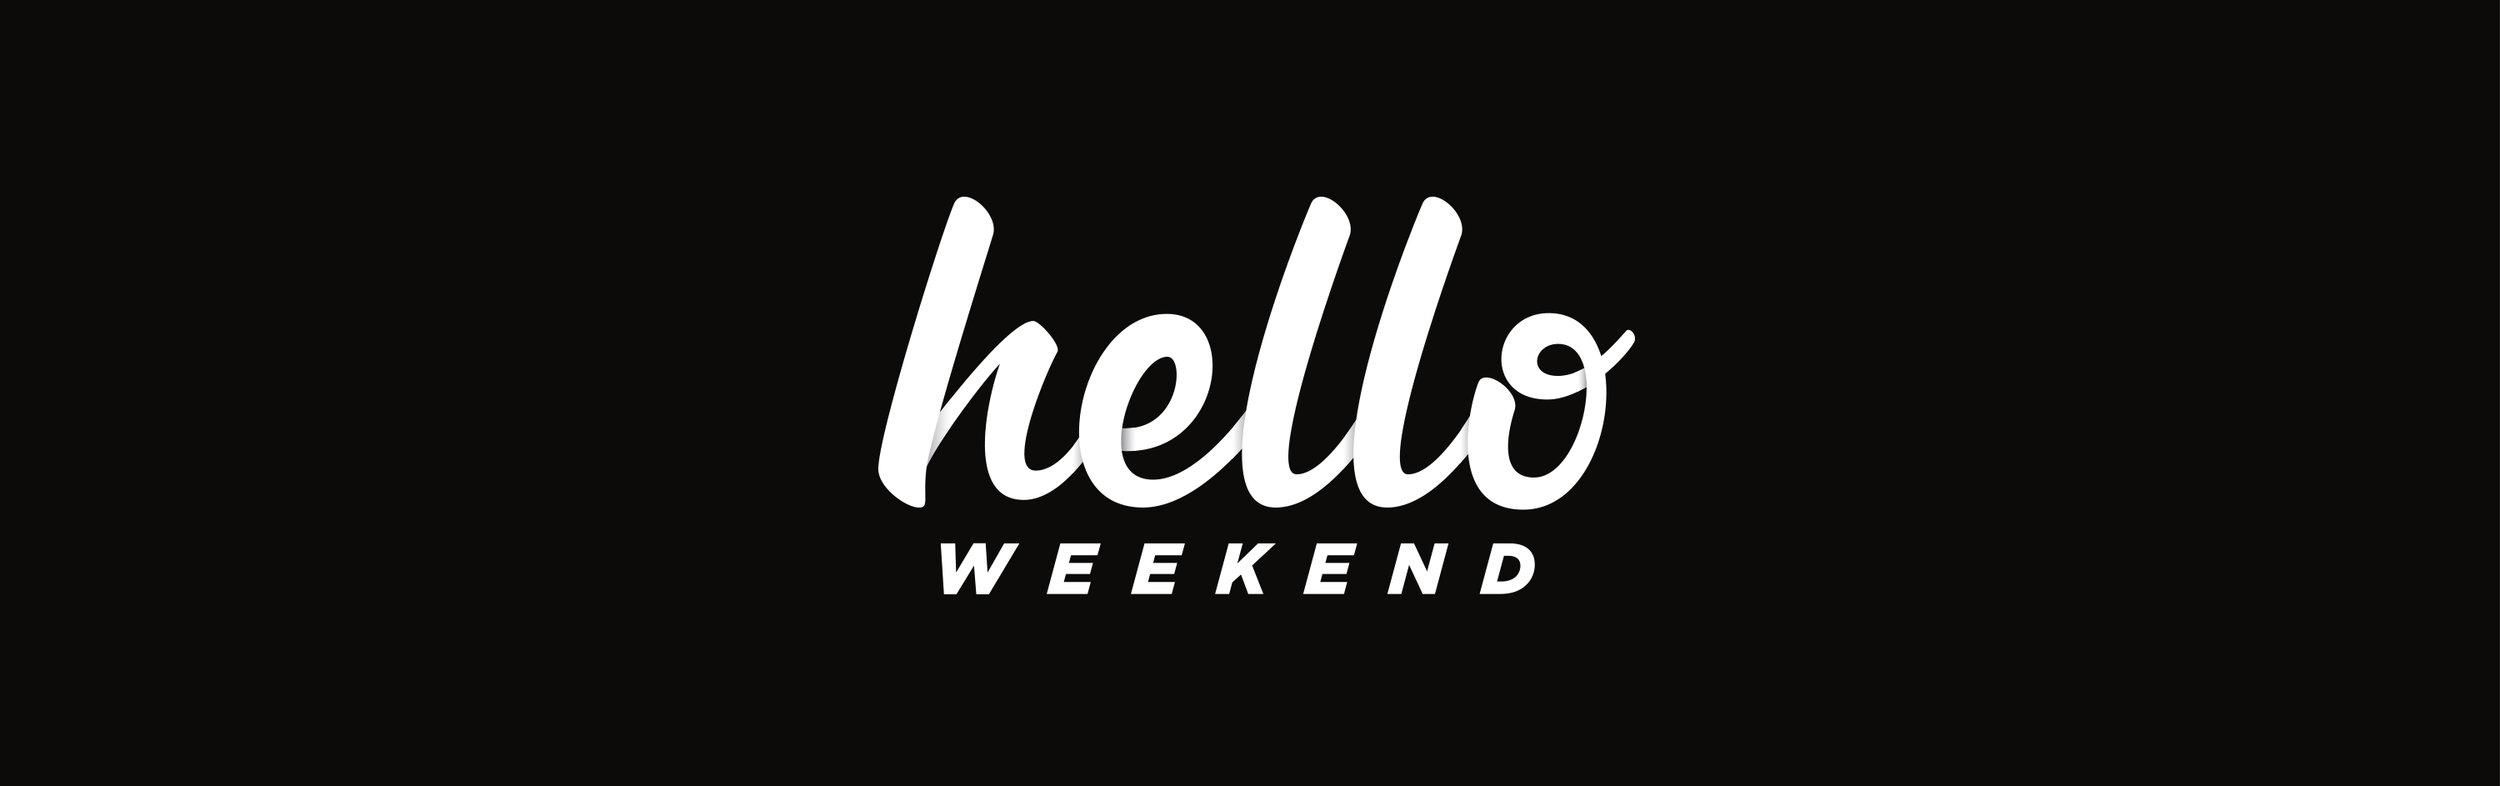 hello weekend_flat image.jpg